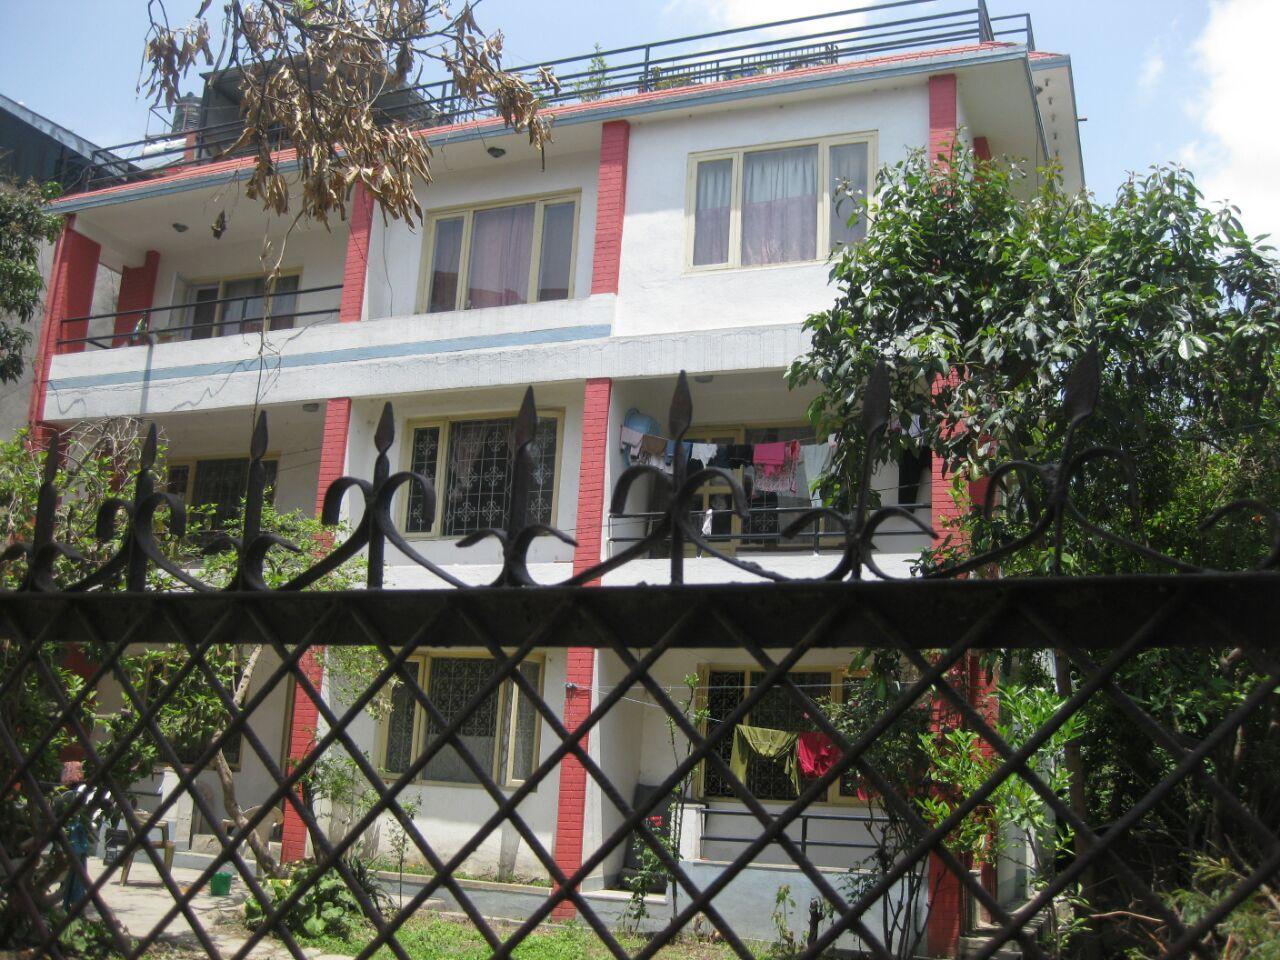 House on Sale at Tinkune , Subidhnagar – IMG-20150504-WA0041